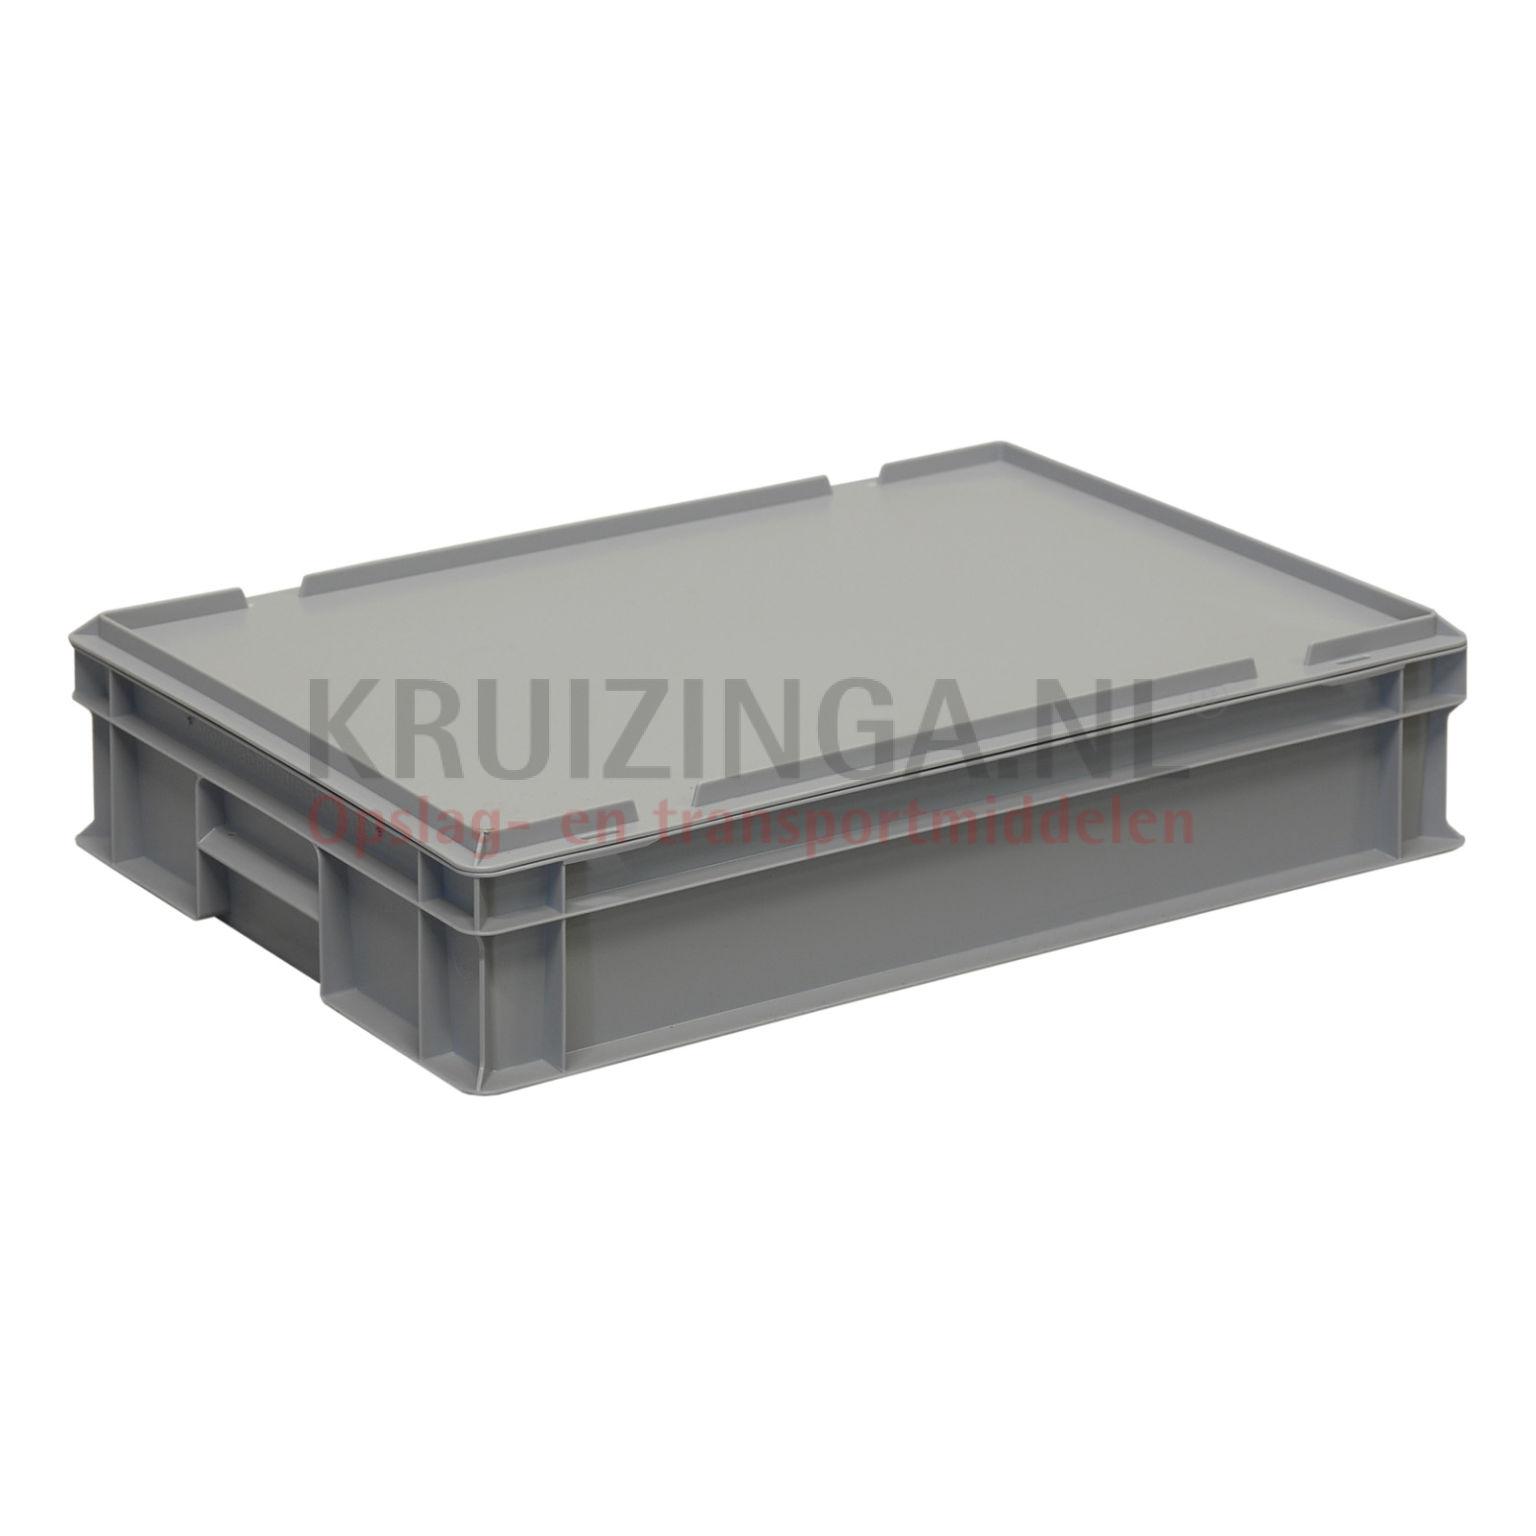 Stapelboxen Kunststoff Zubehor Deckel Ab 4 80 Frei Haus Kruizinga De